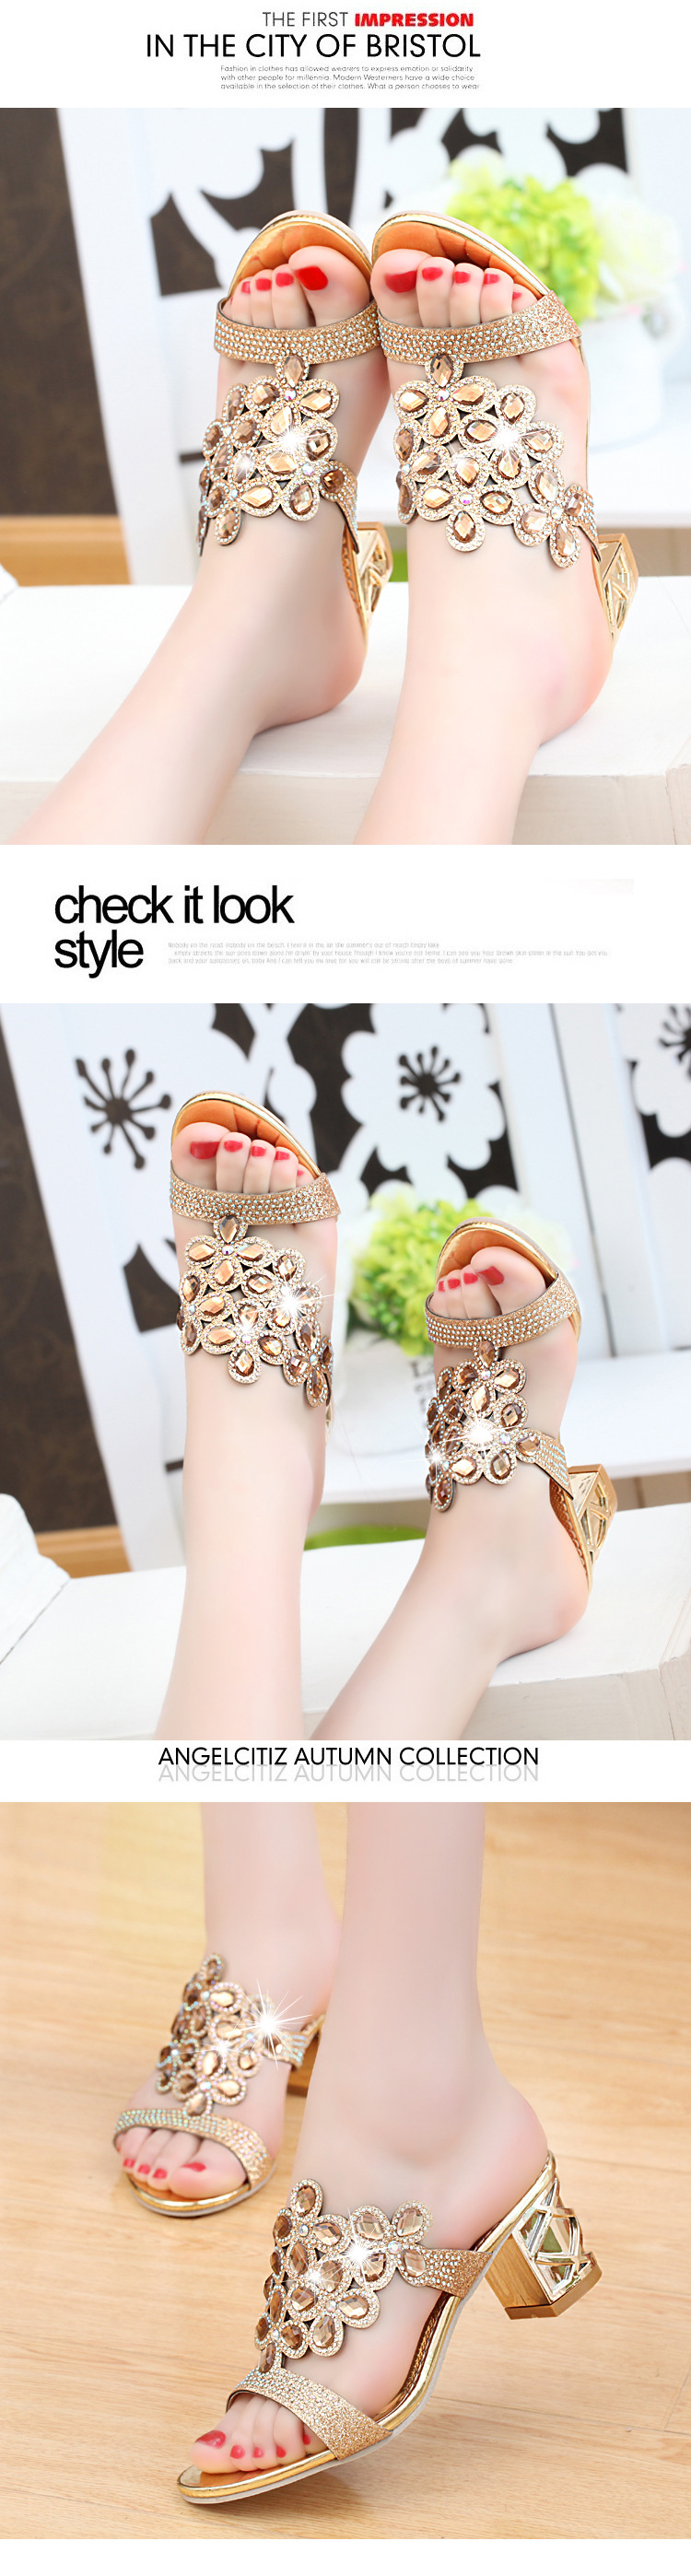 HTB1Q.yWiHuWBuNjSszgq6z8jVXag Designer Sandals Women 2018 Ladies Slides Women Slippers Sandals Summer Crystal Shoes Peep Toe Middle Heels Zapatos Mujer